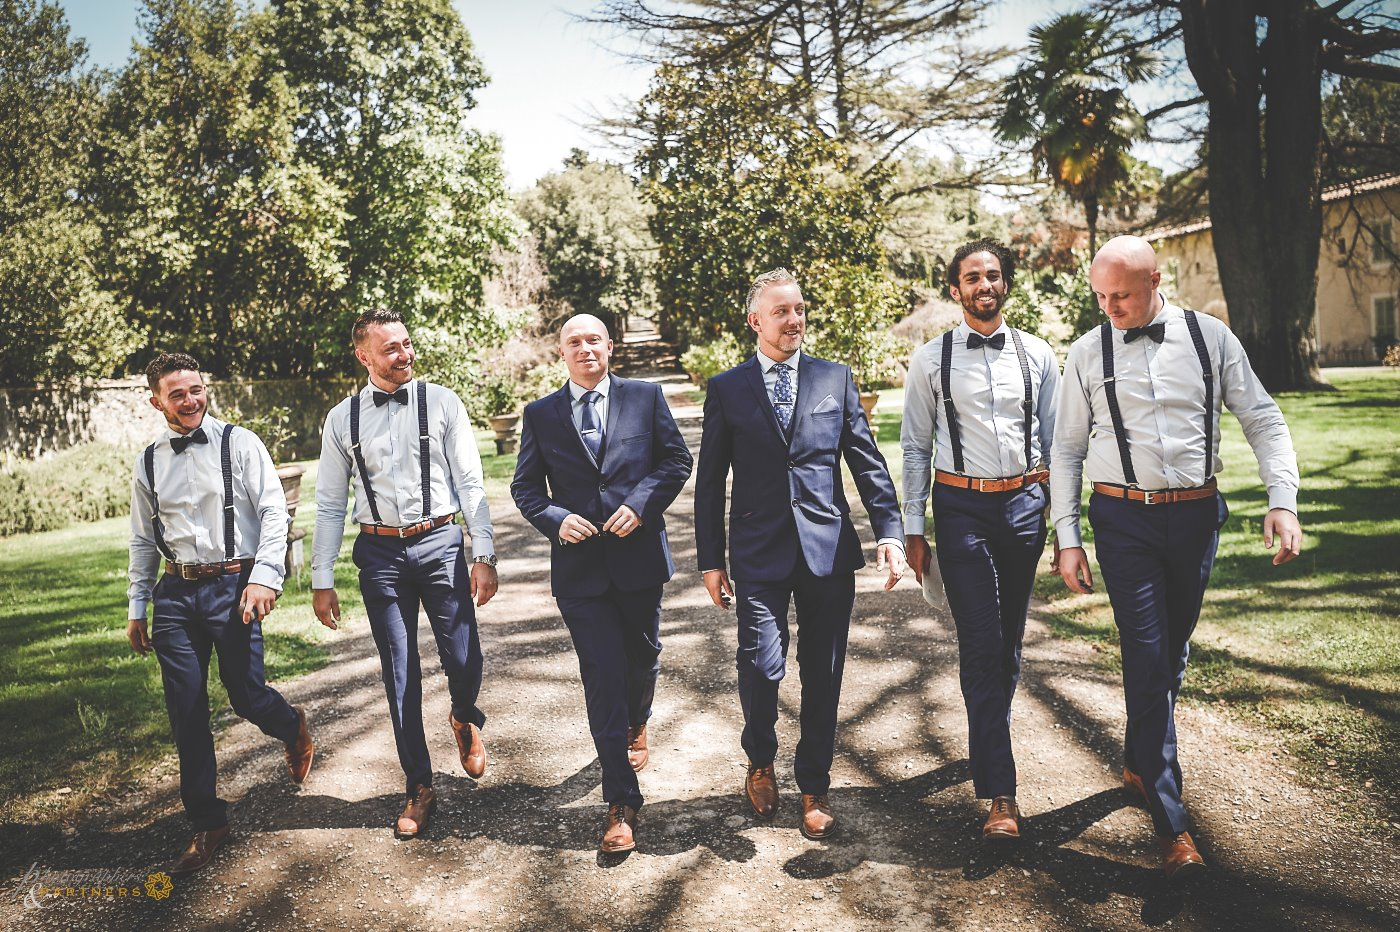 photography_weddings_villa_grazioli_04.jpg